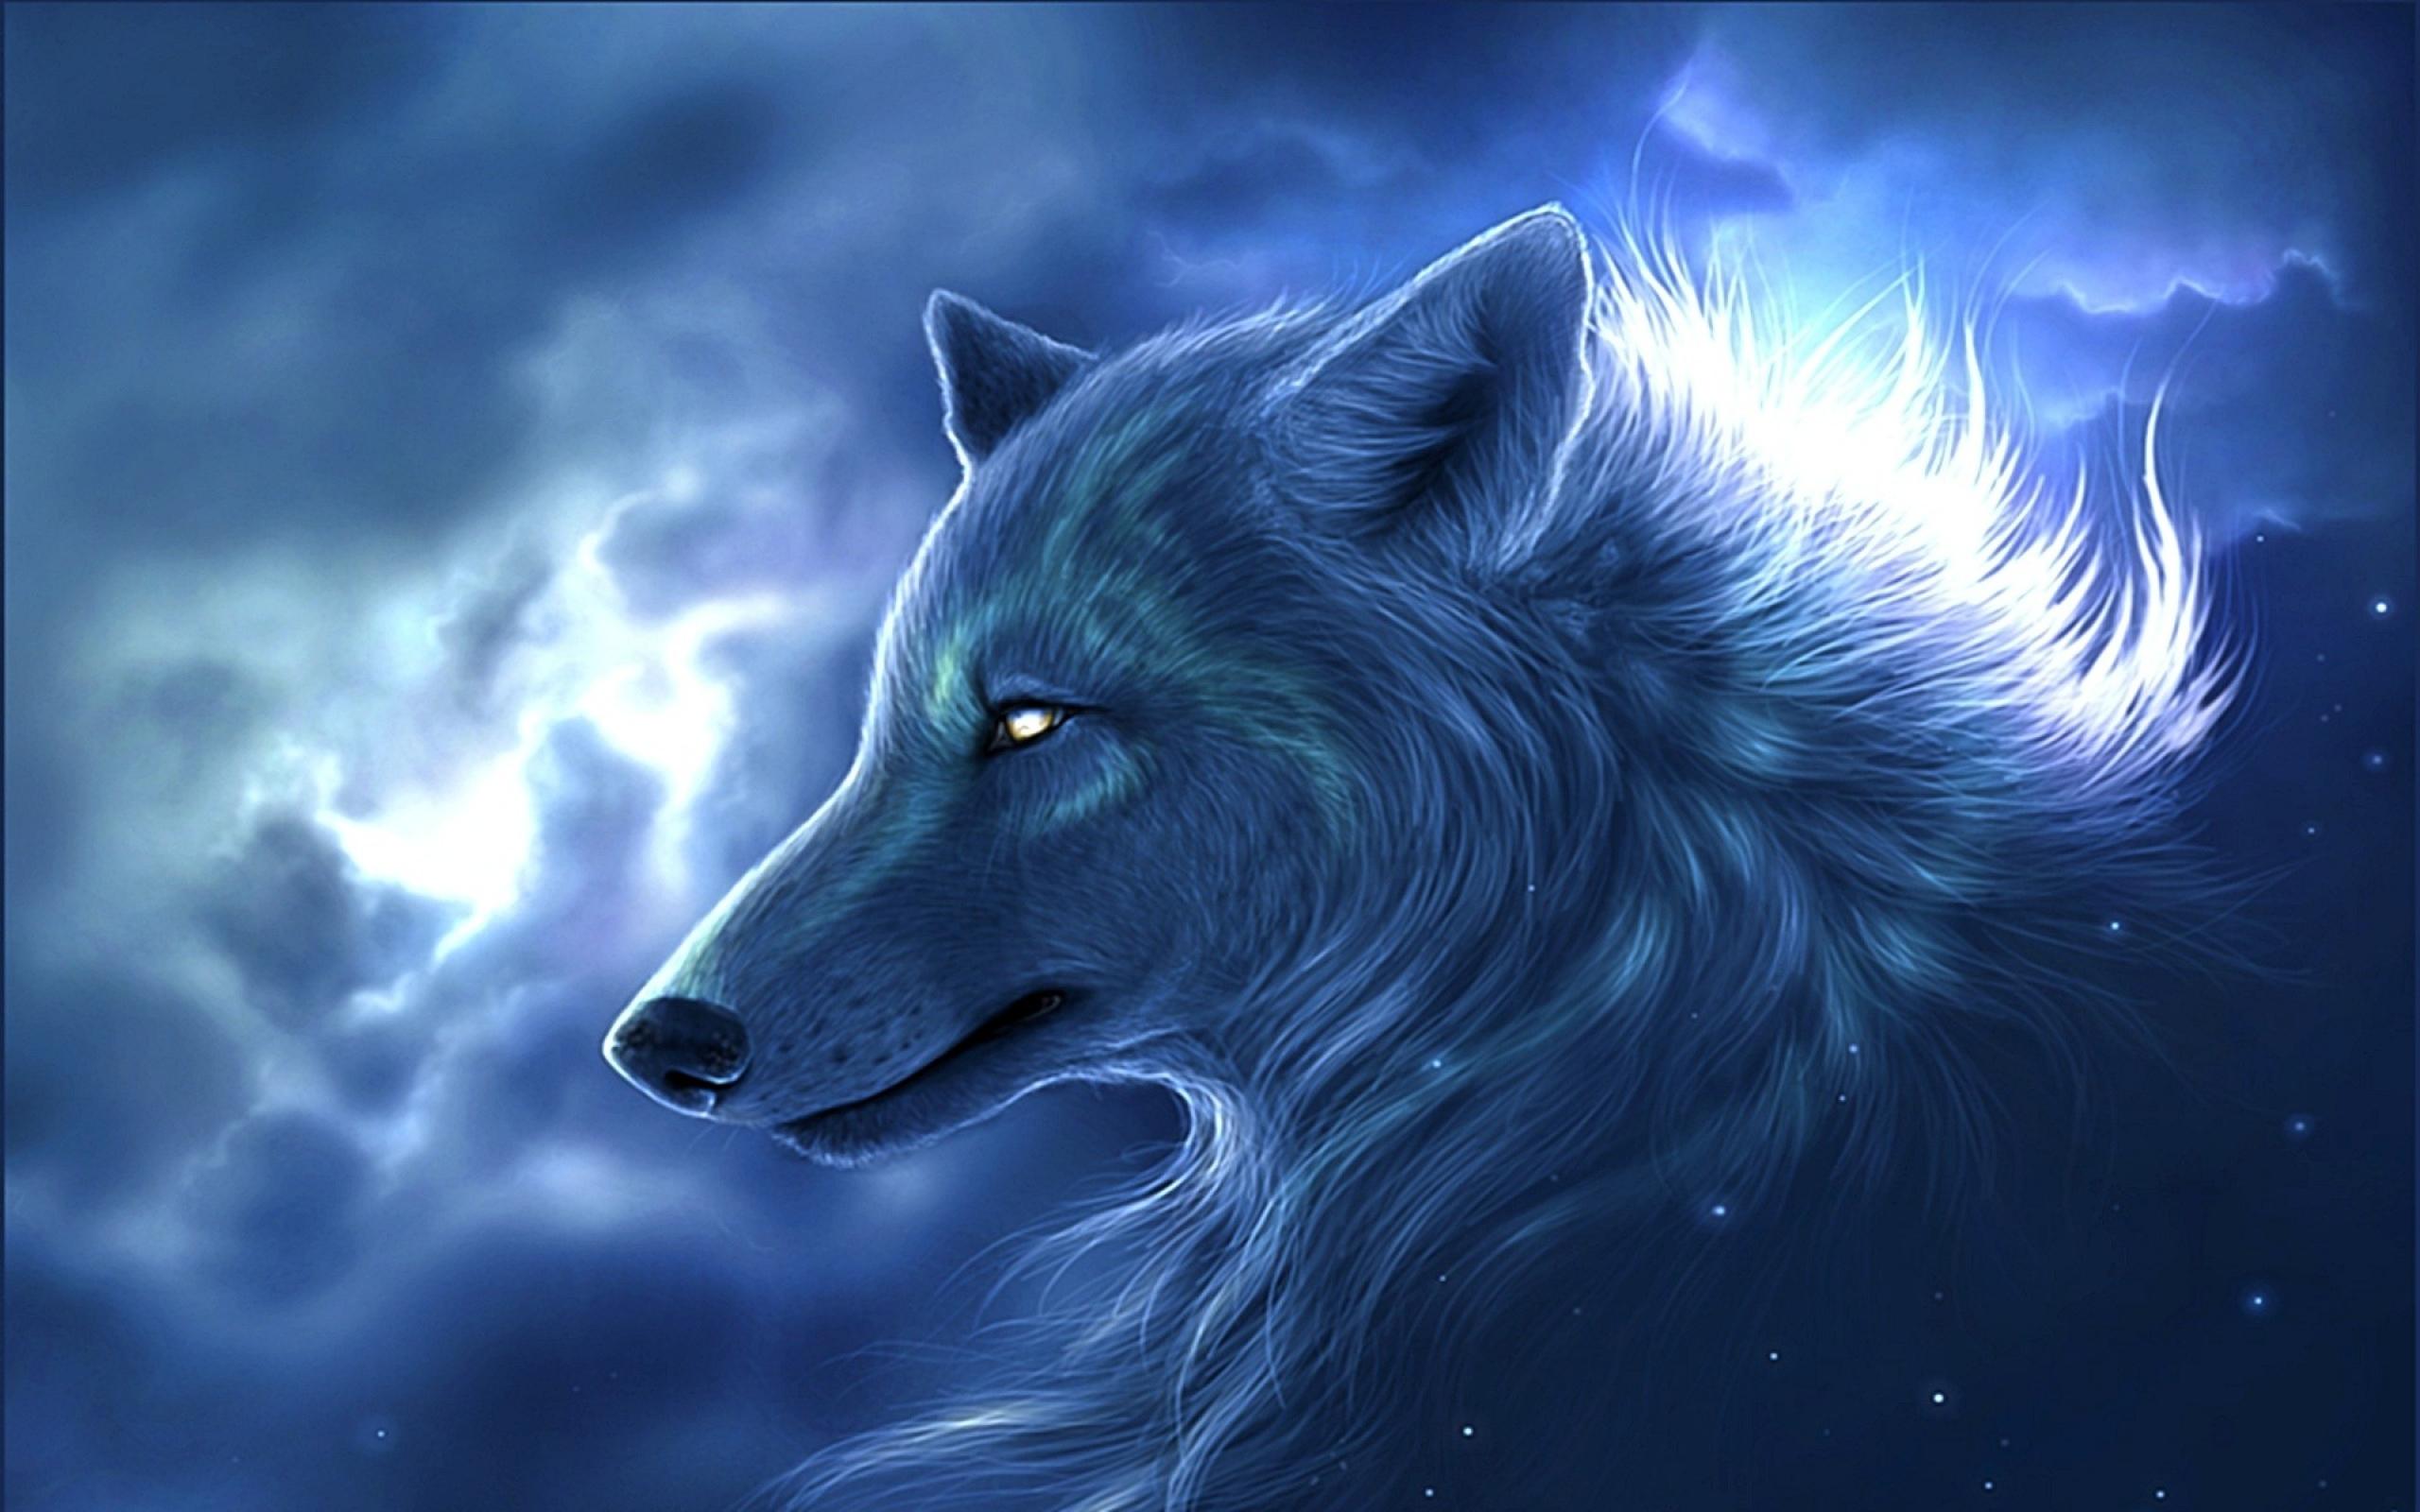 Wolf Spirit 3 Boytoy 84 Wallpaper 37139303 Fanpop